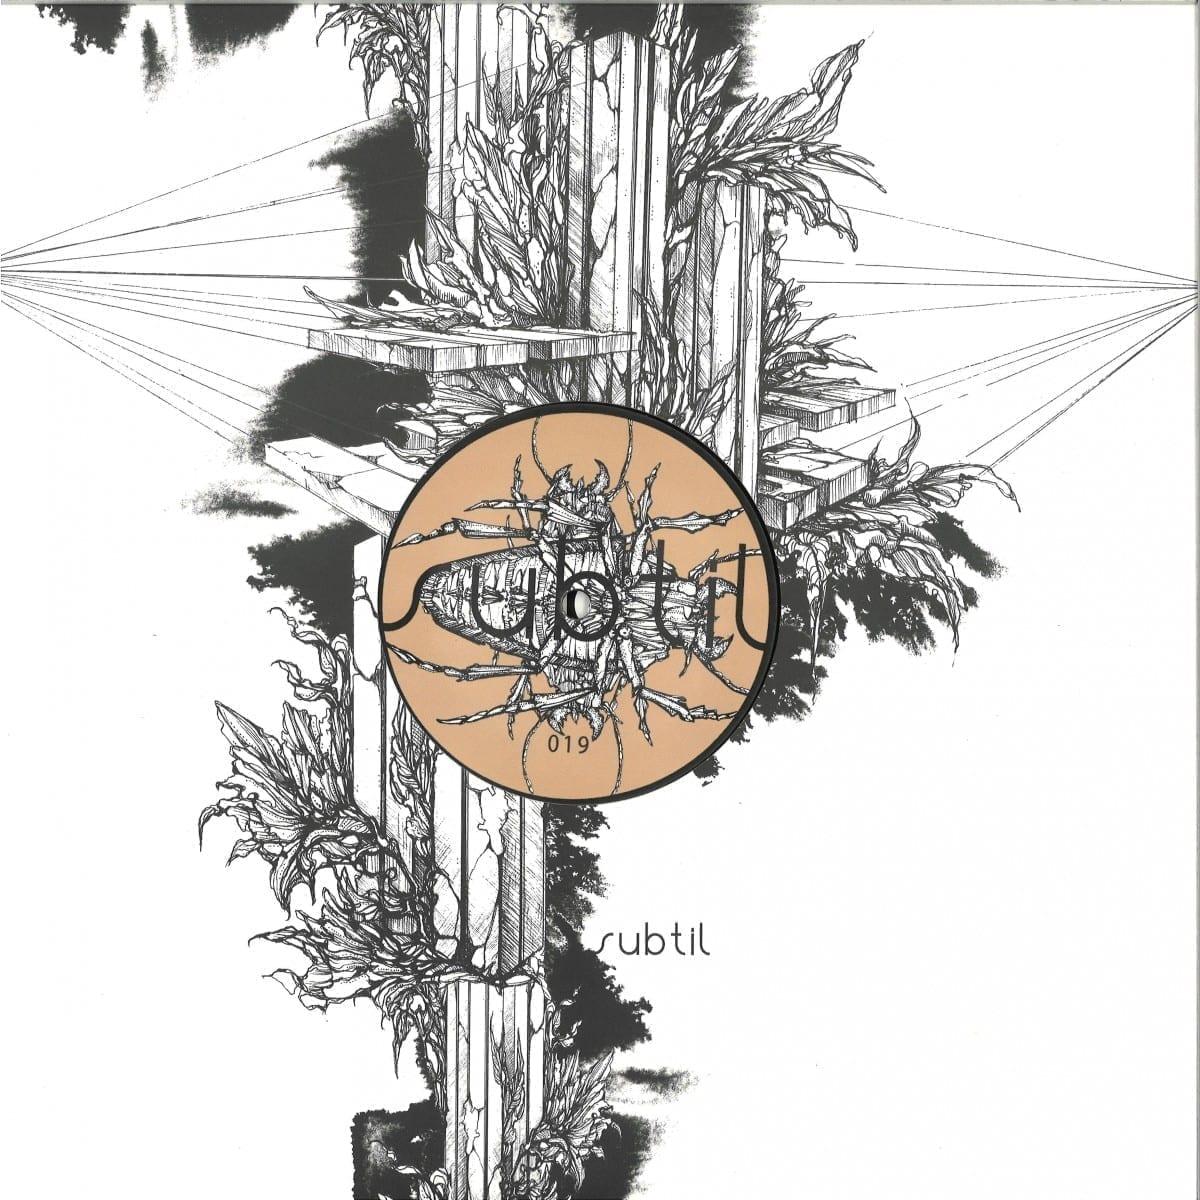 Traumer- Temple [Subtil] 01